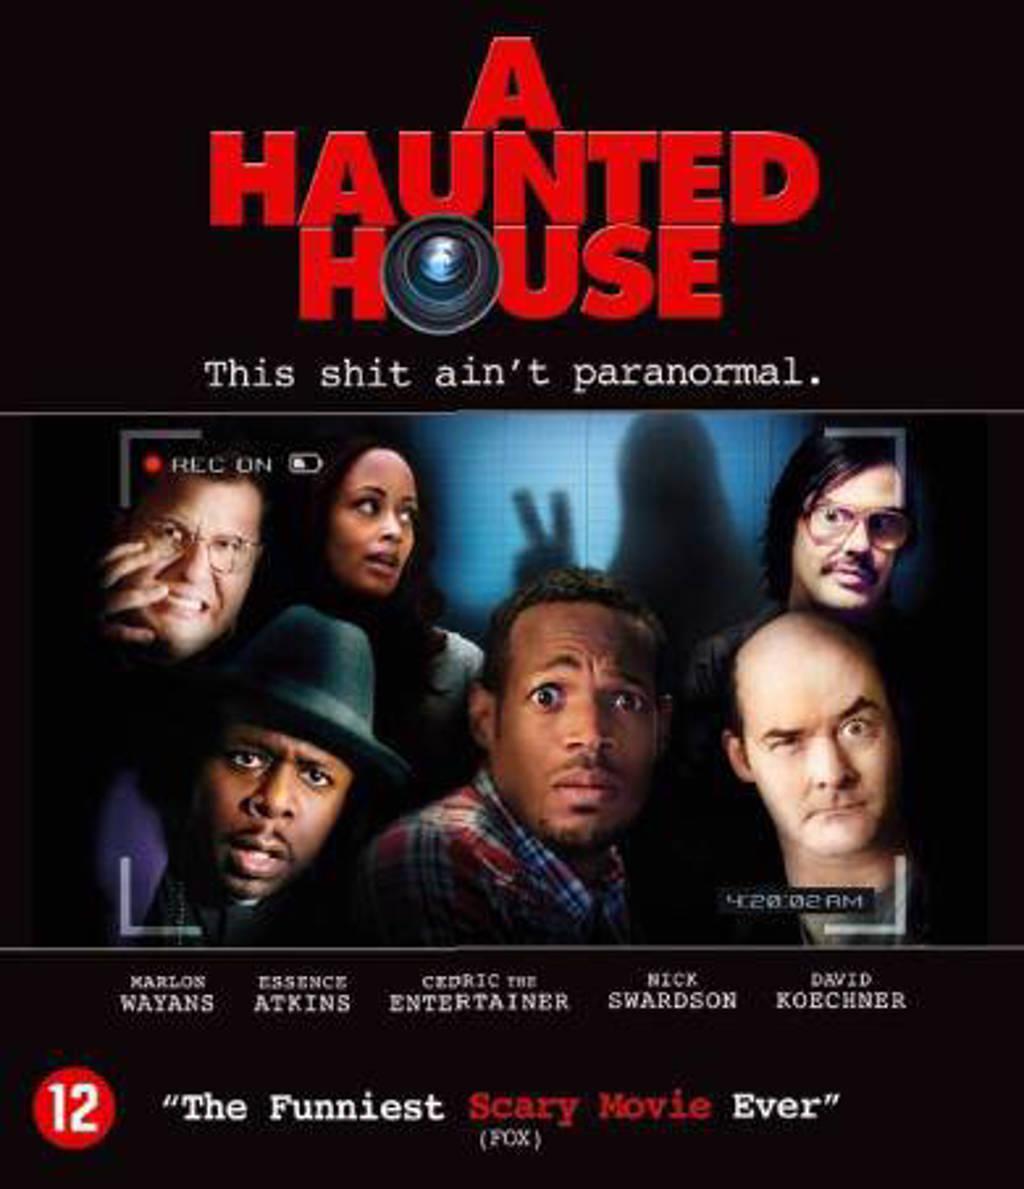 Haunted house (Blu-ray)